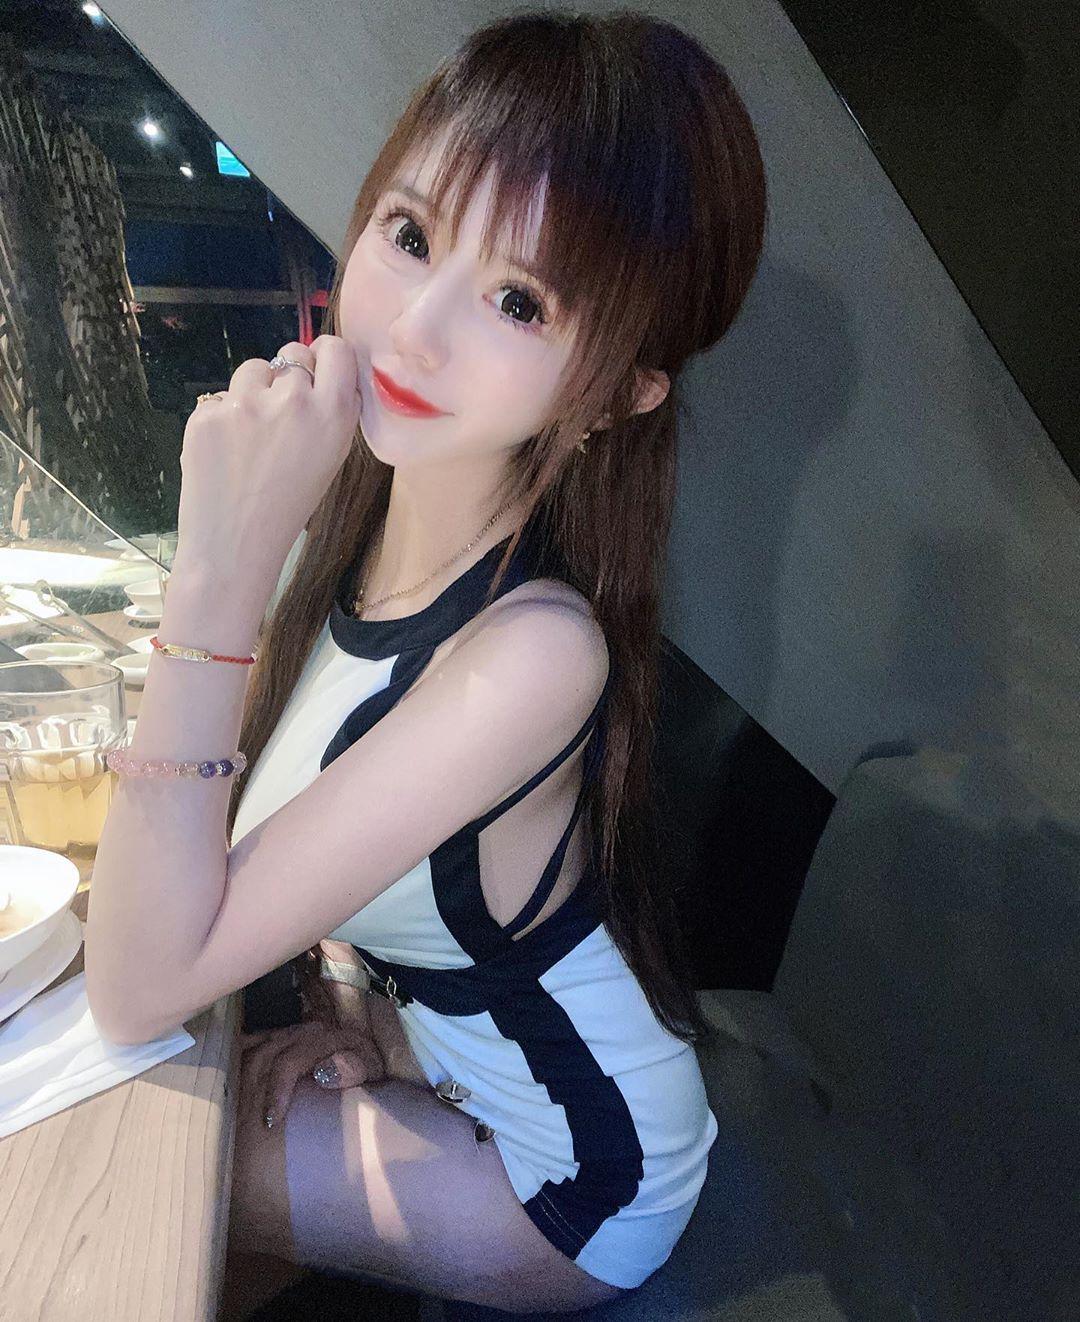 ezUVaDwc o - IG正妹—蔡粉粉